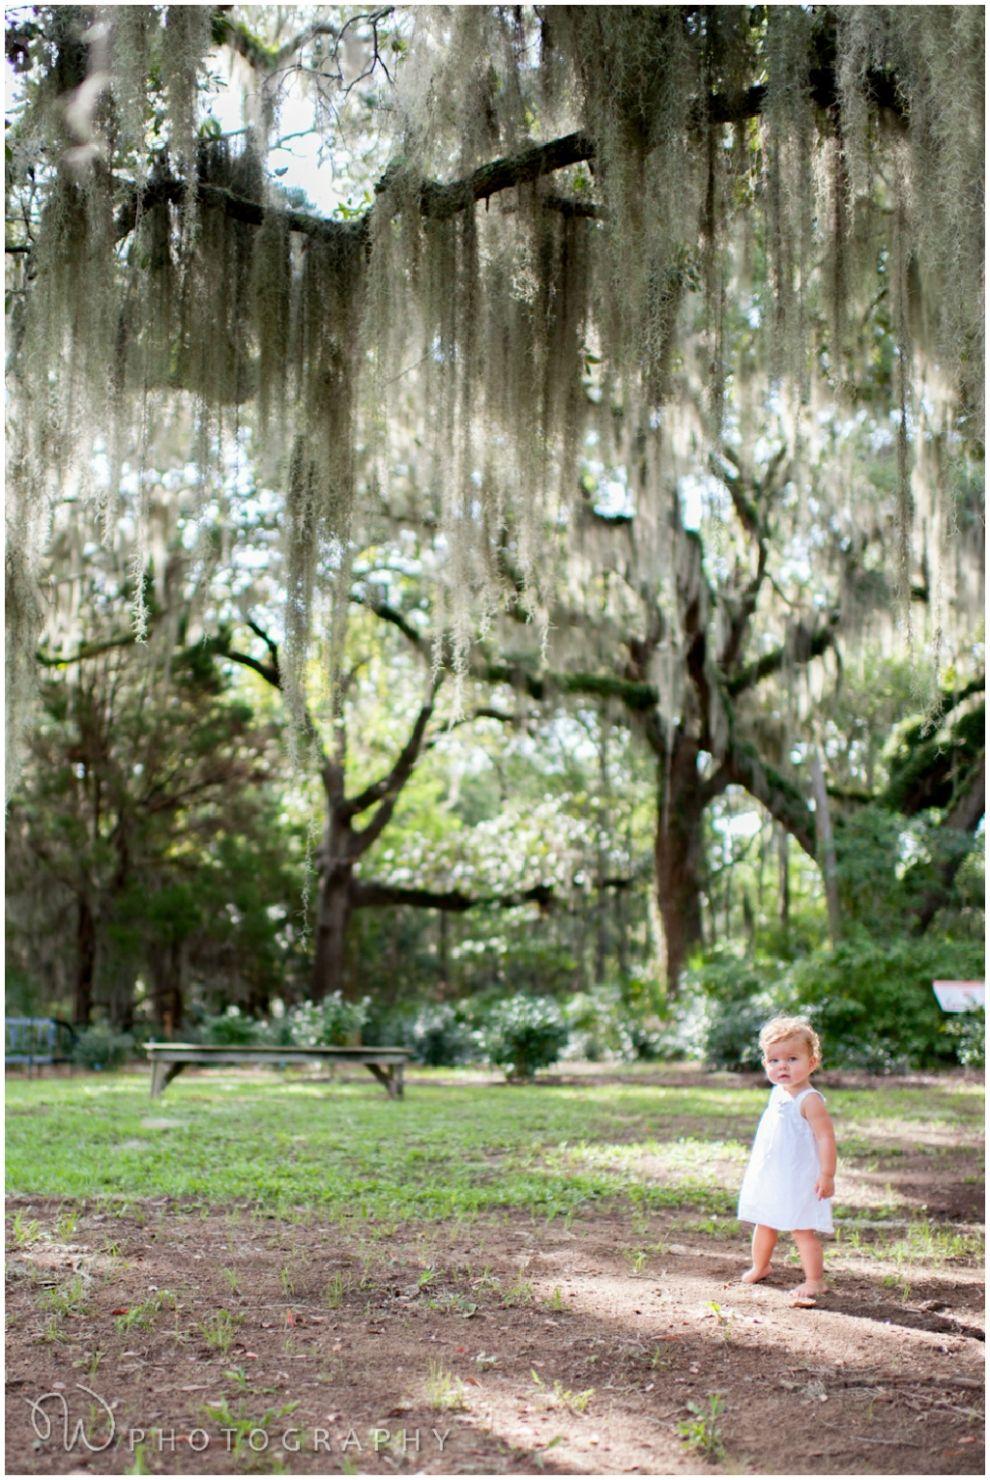 one year photo ideas. live oaks. hilton head island family photographer. W PHOTOGRAPHY 2014